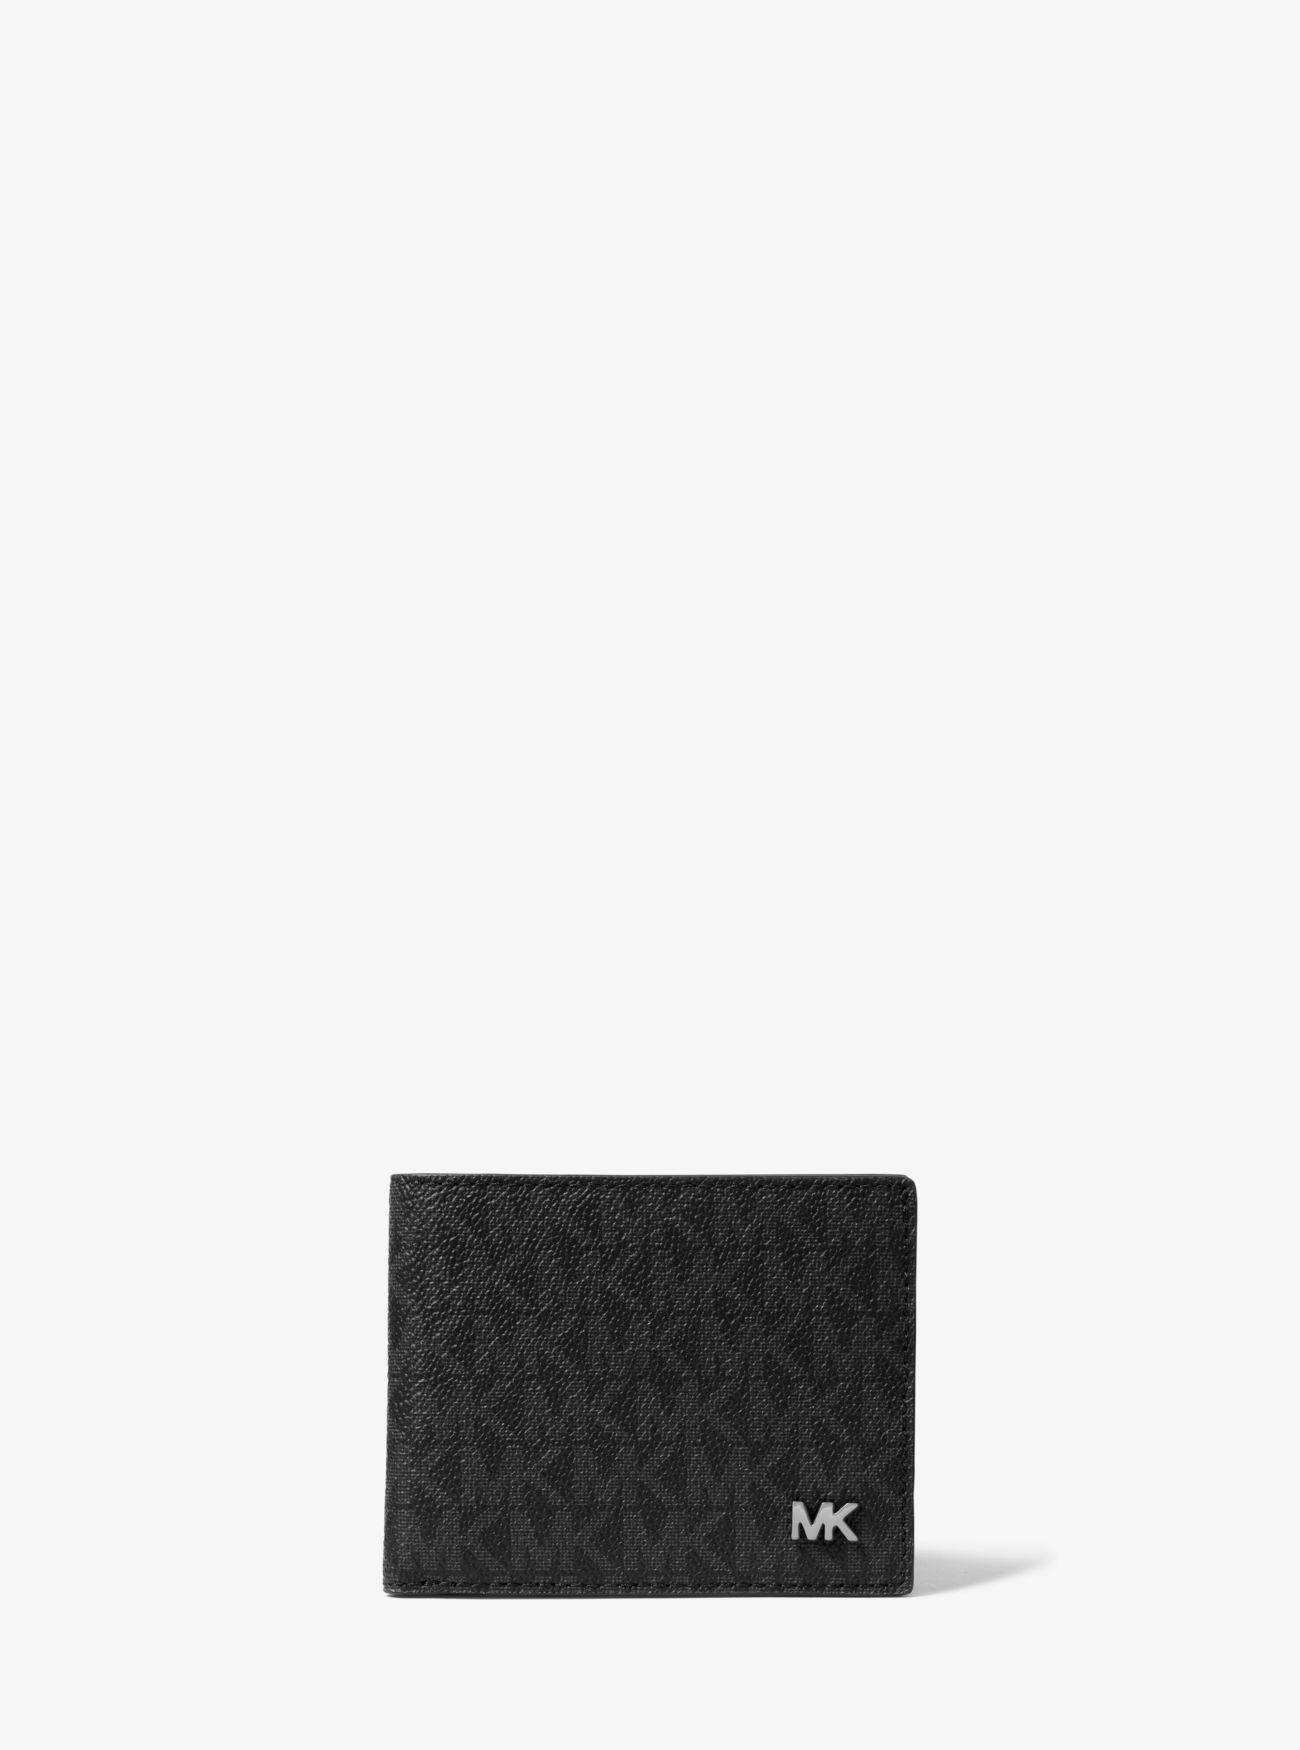 f03492d59a24 Lyst - Michael Kors Jet Set Logo Billfold Wallet in Black for Men